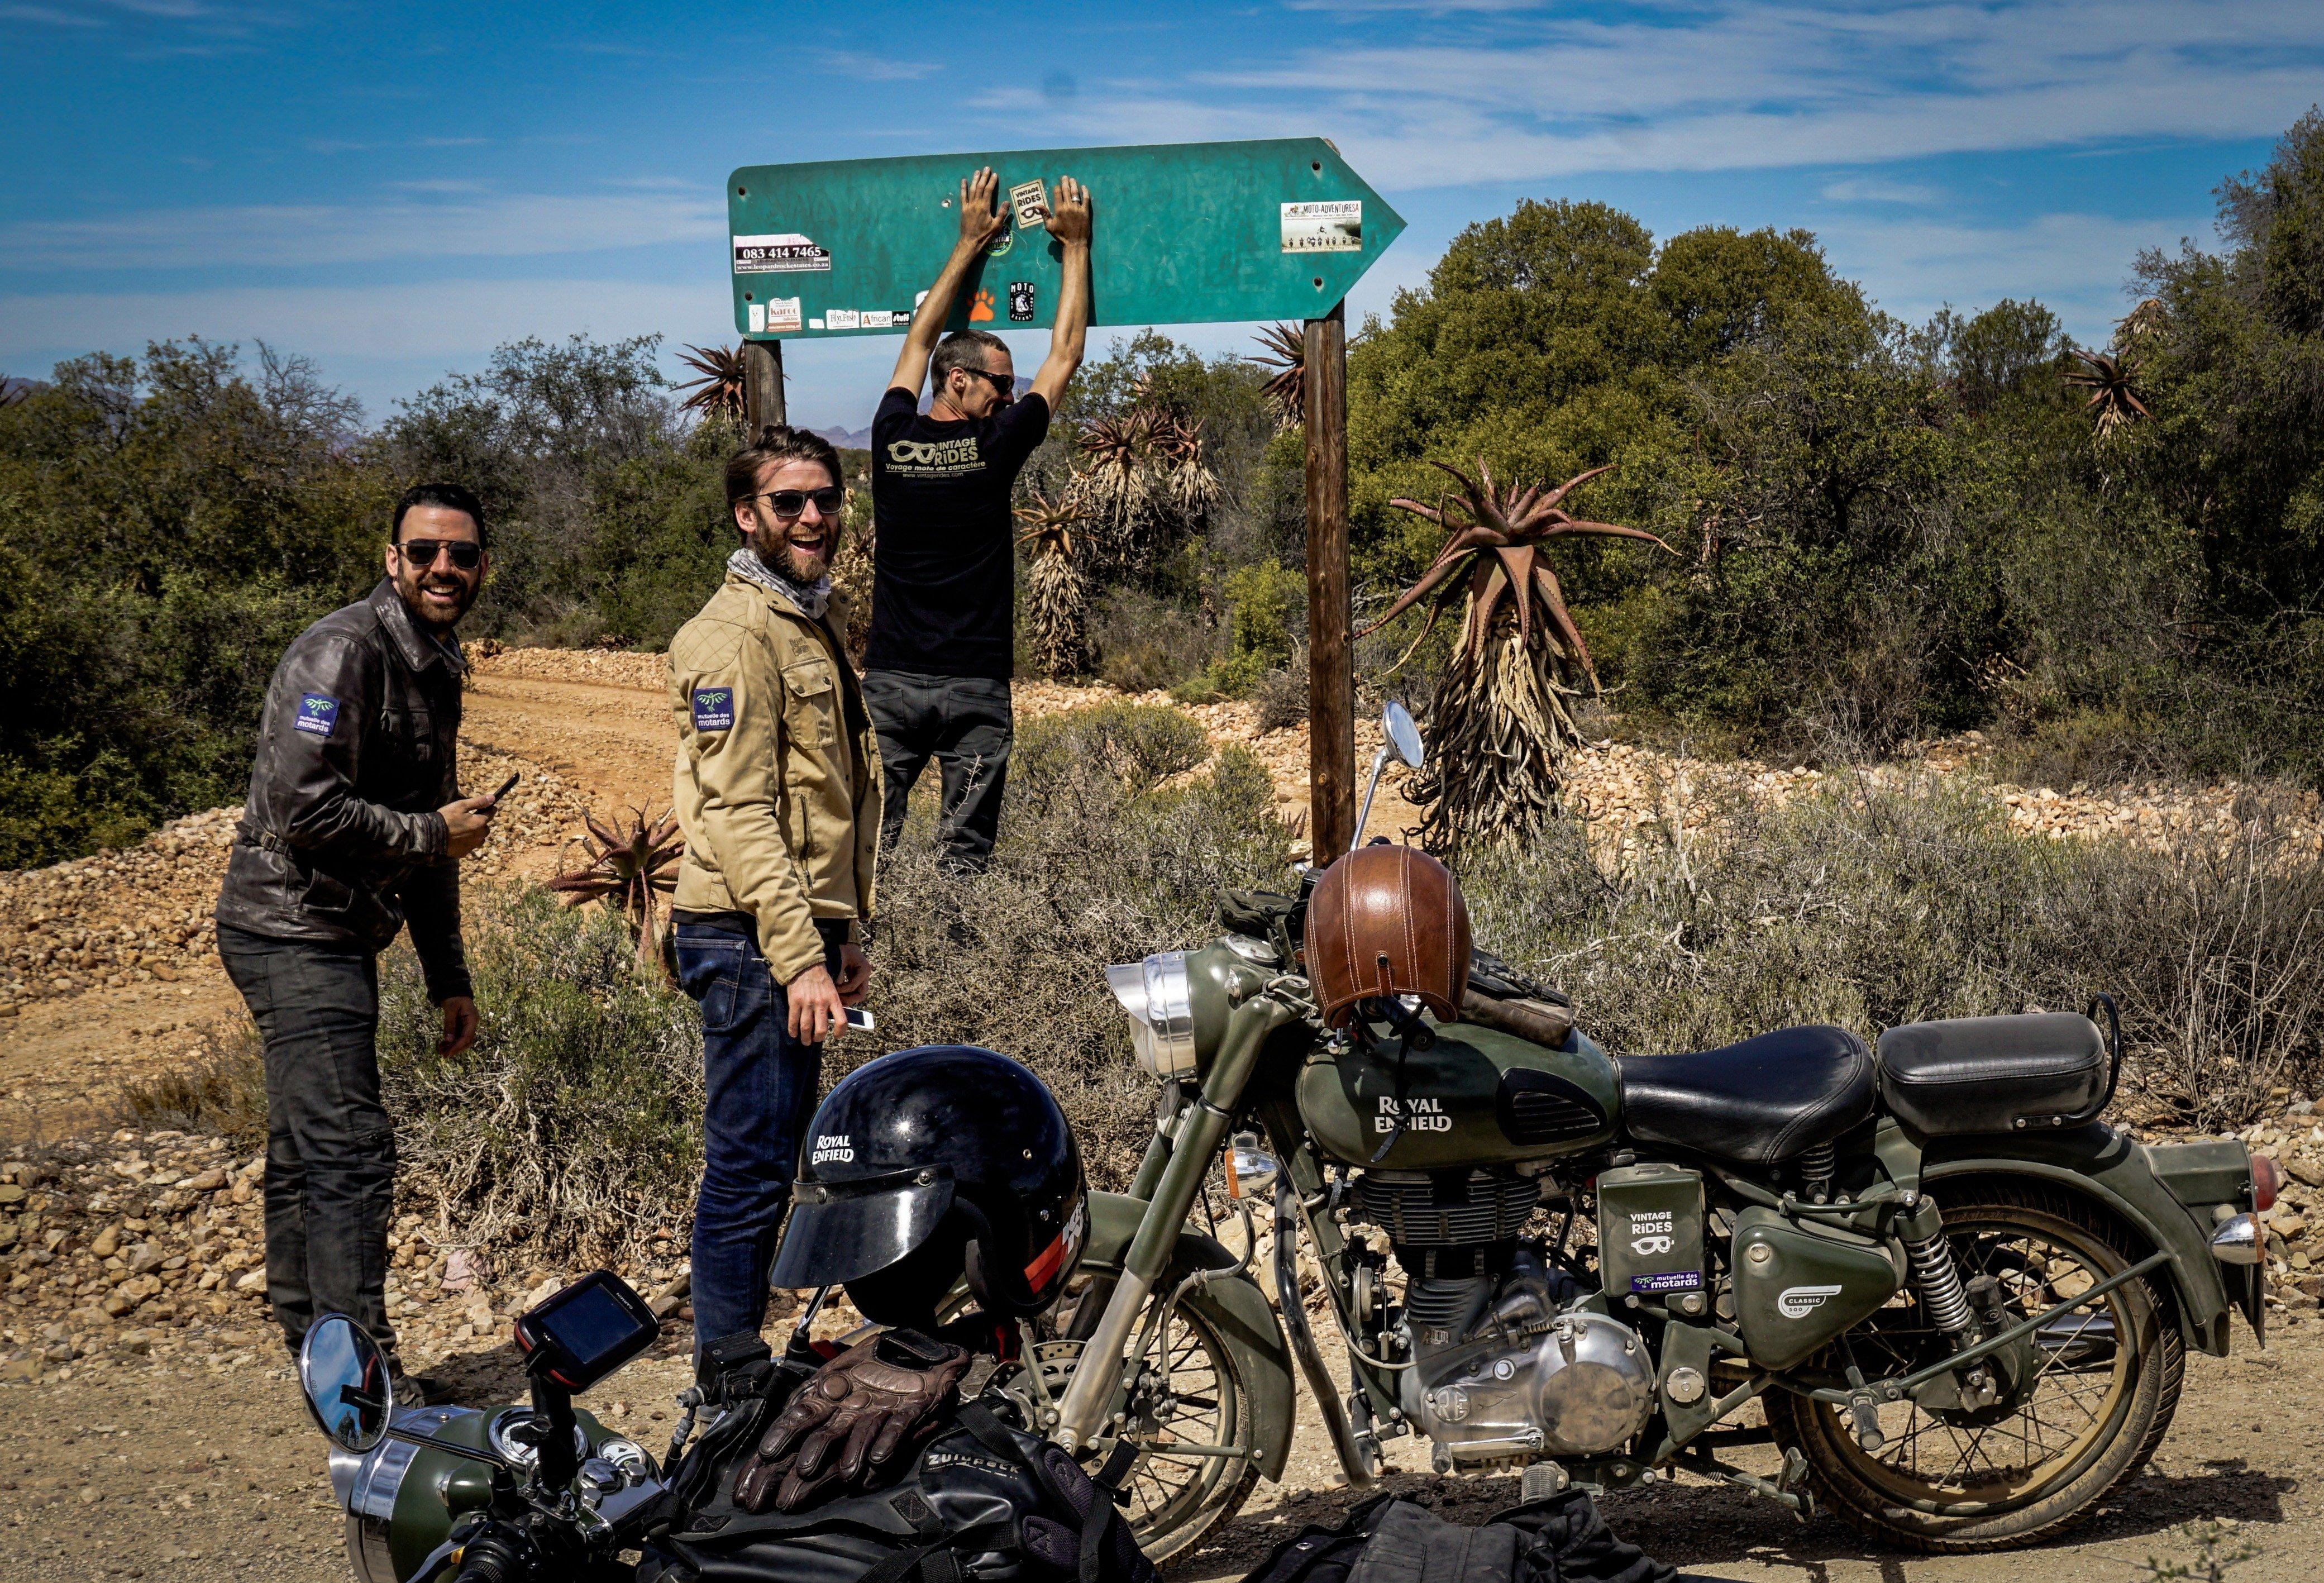 south africa motorcycle tours vintage rides. Black Bedroom Furniture Sets. Home Design Ideas